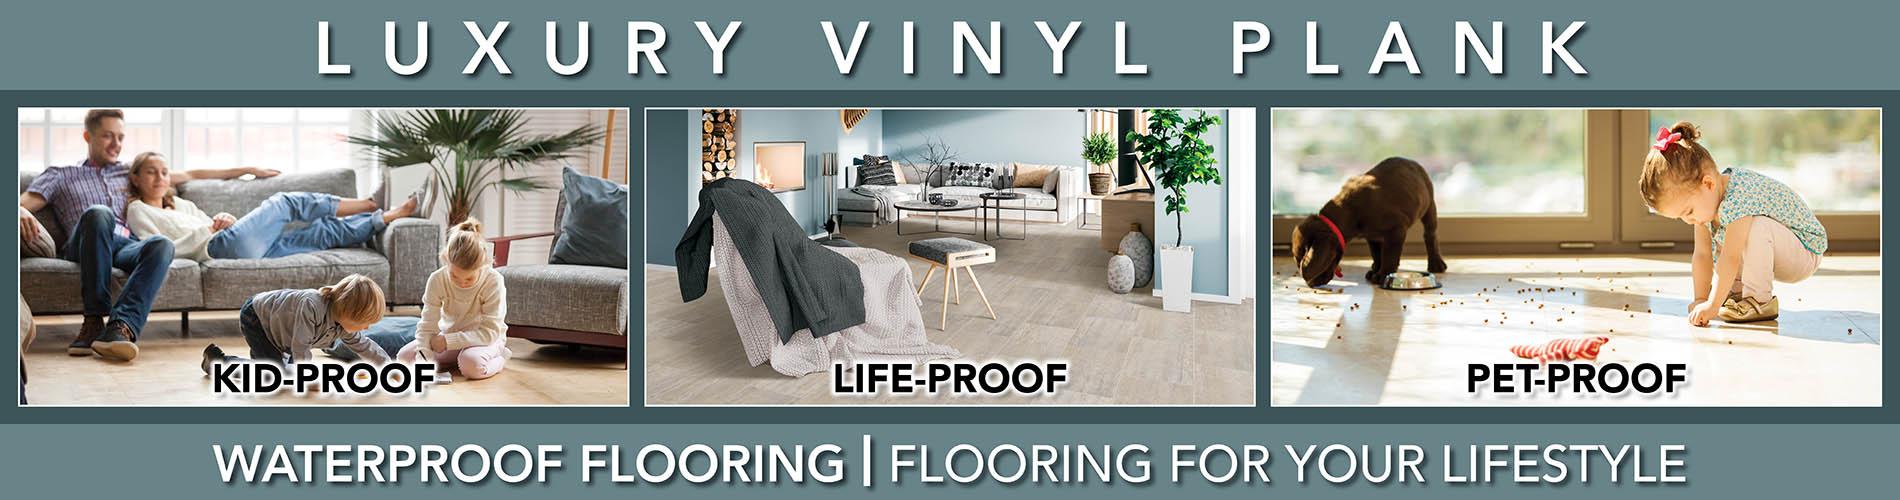 Luxury Vinyl Plank Waterproof Flooring at Abbey Capitol Floors & Interiors in Olympia, WA